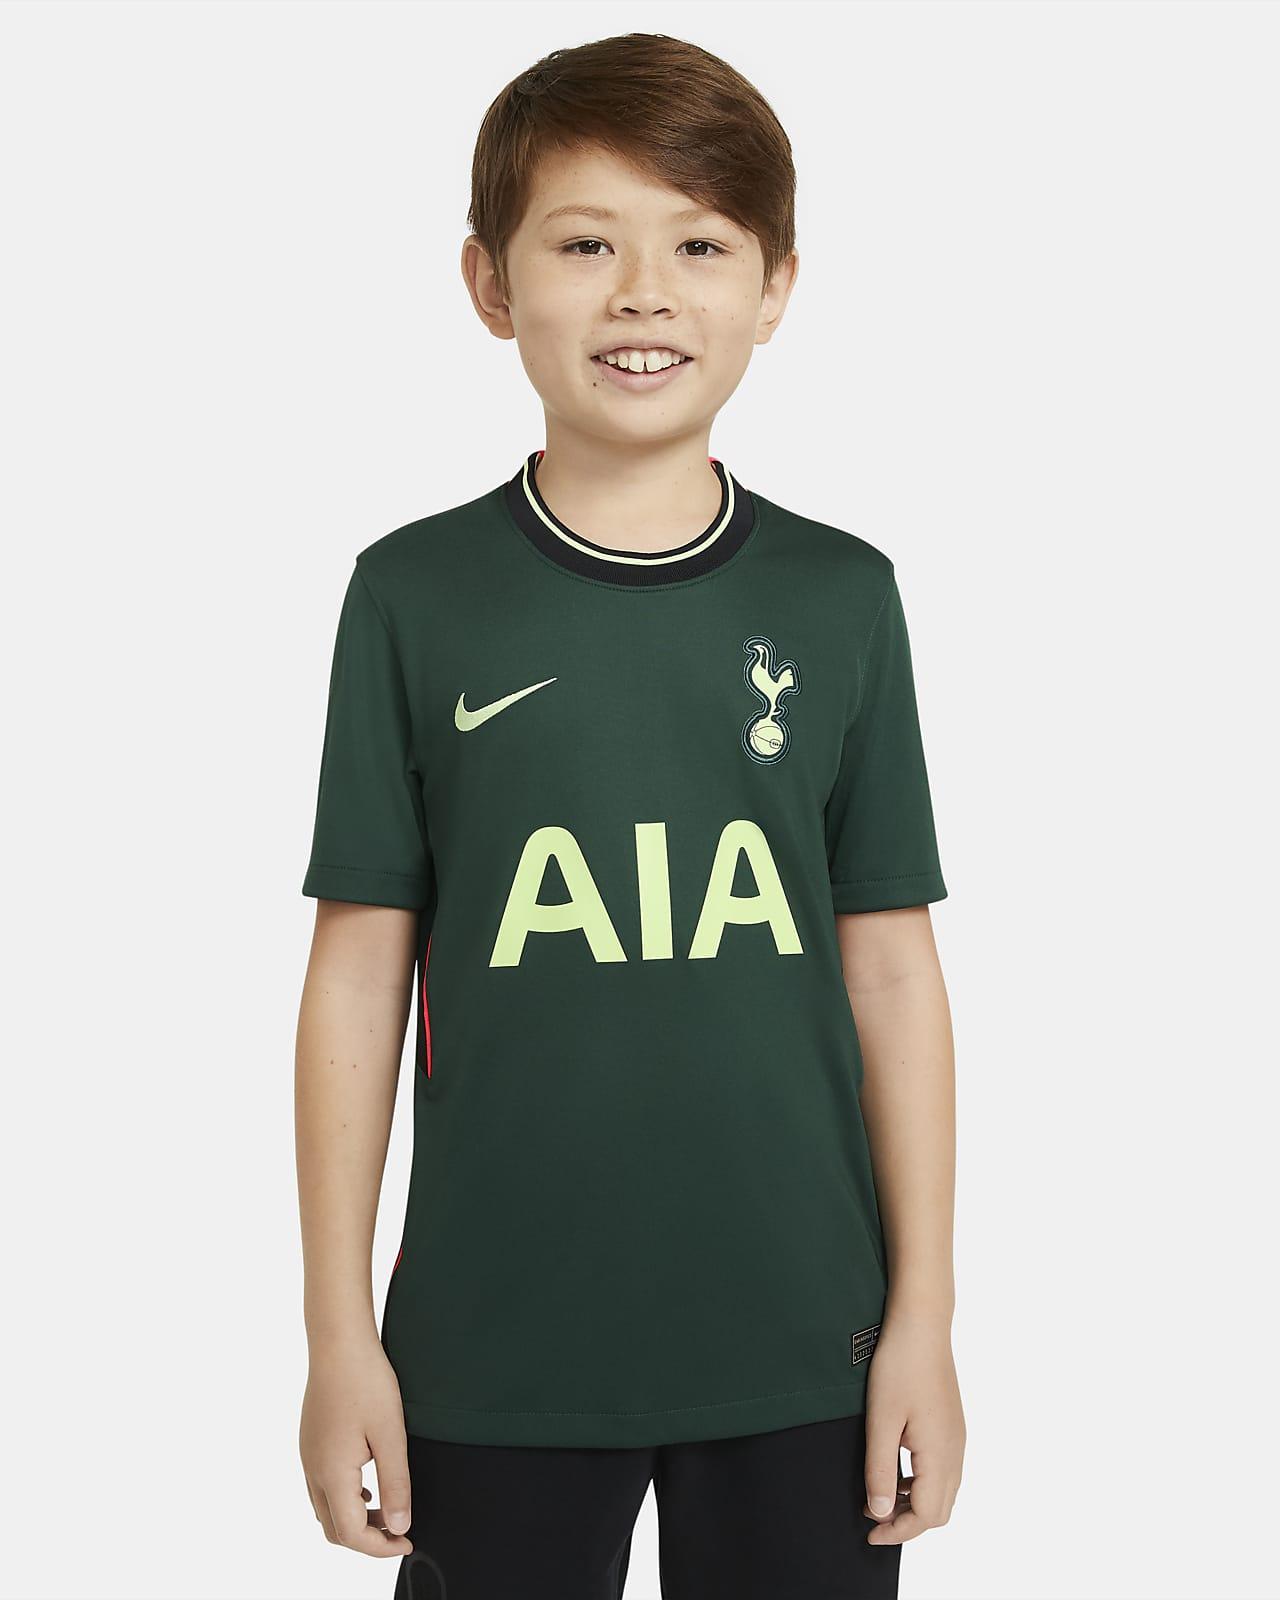 Tottenham Hotspur 2020/21 Stadium Away Big Kids' Soccer Jersey